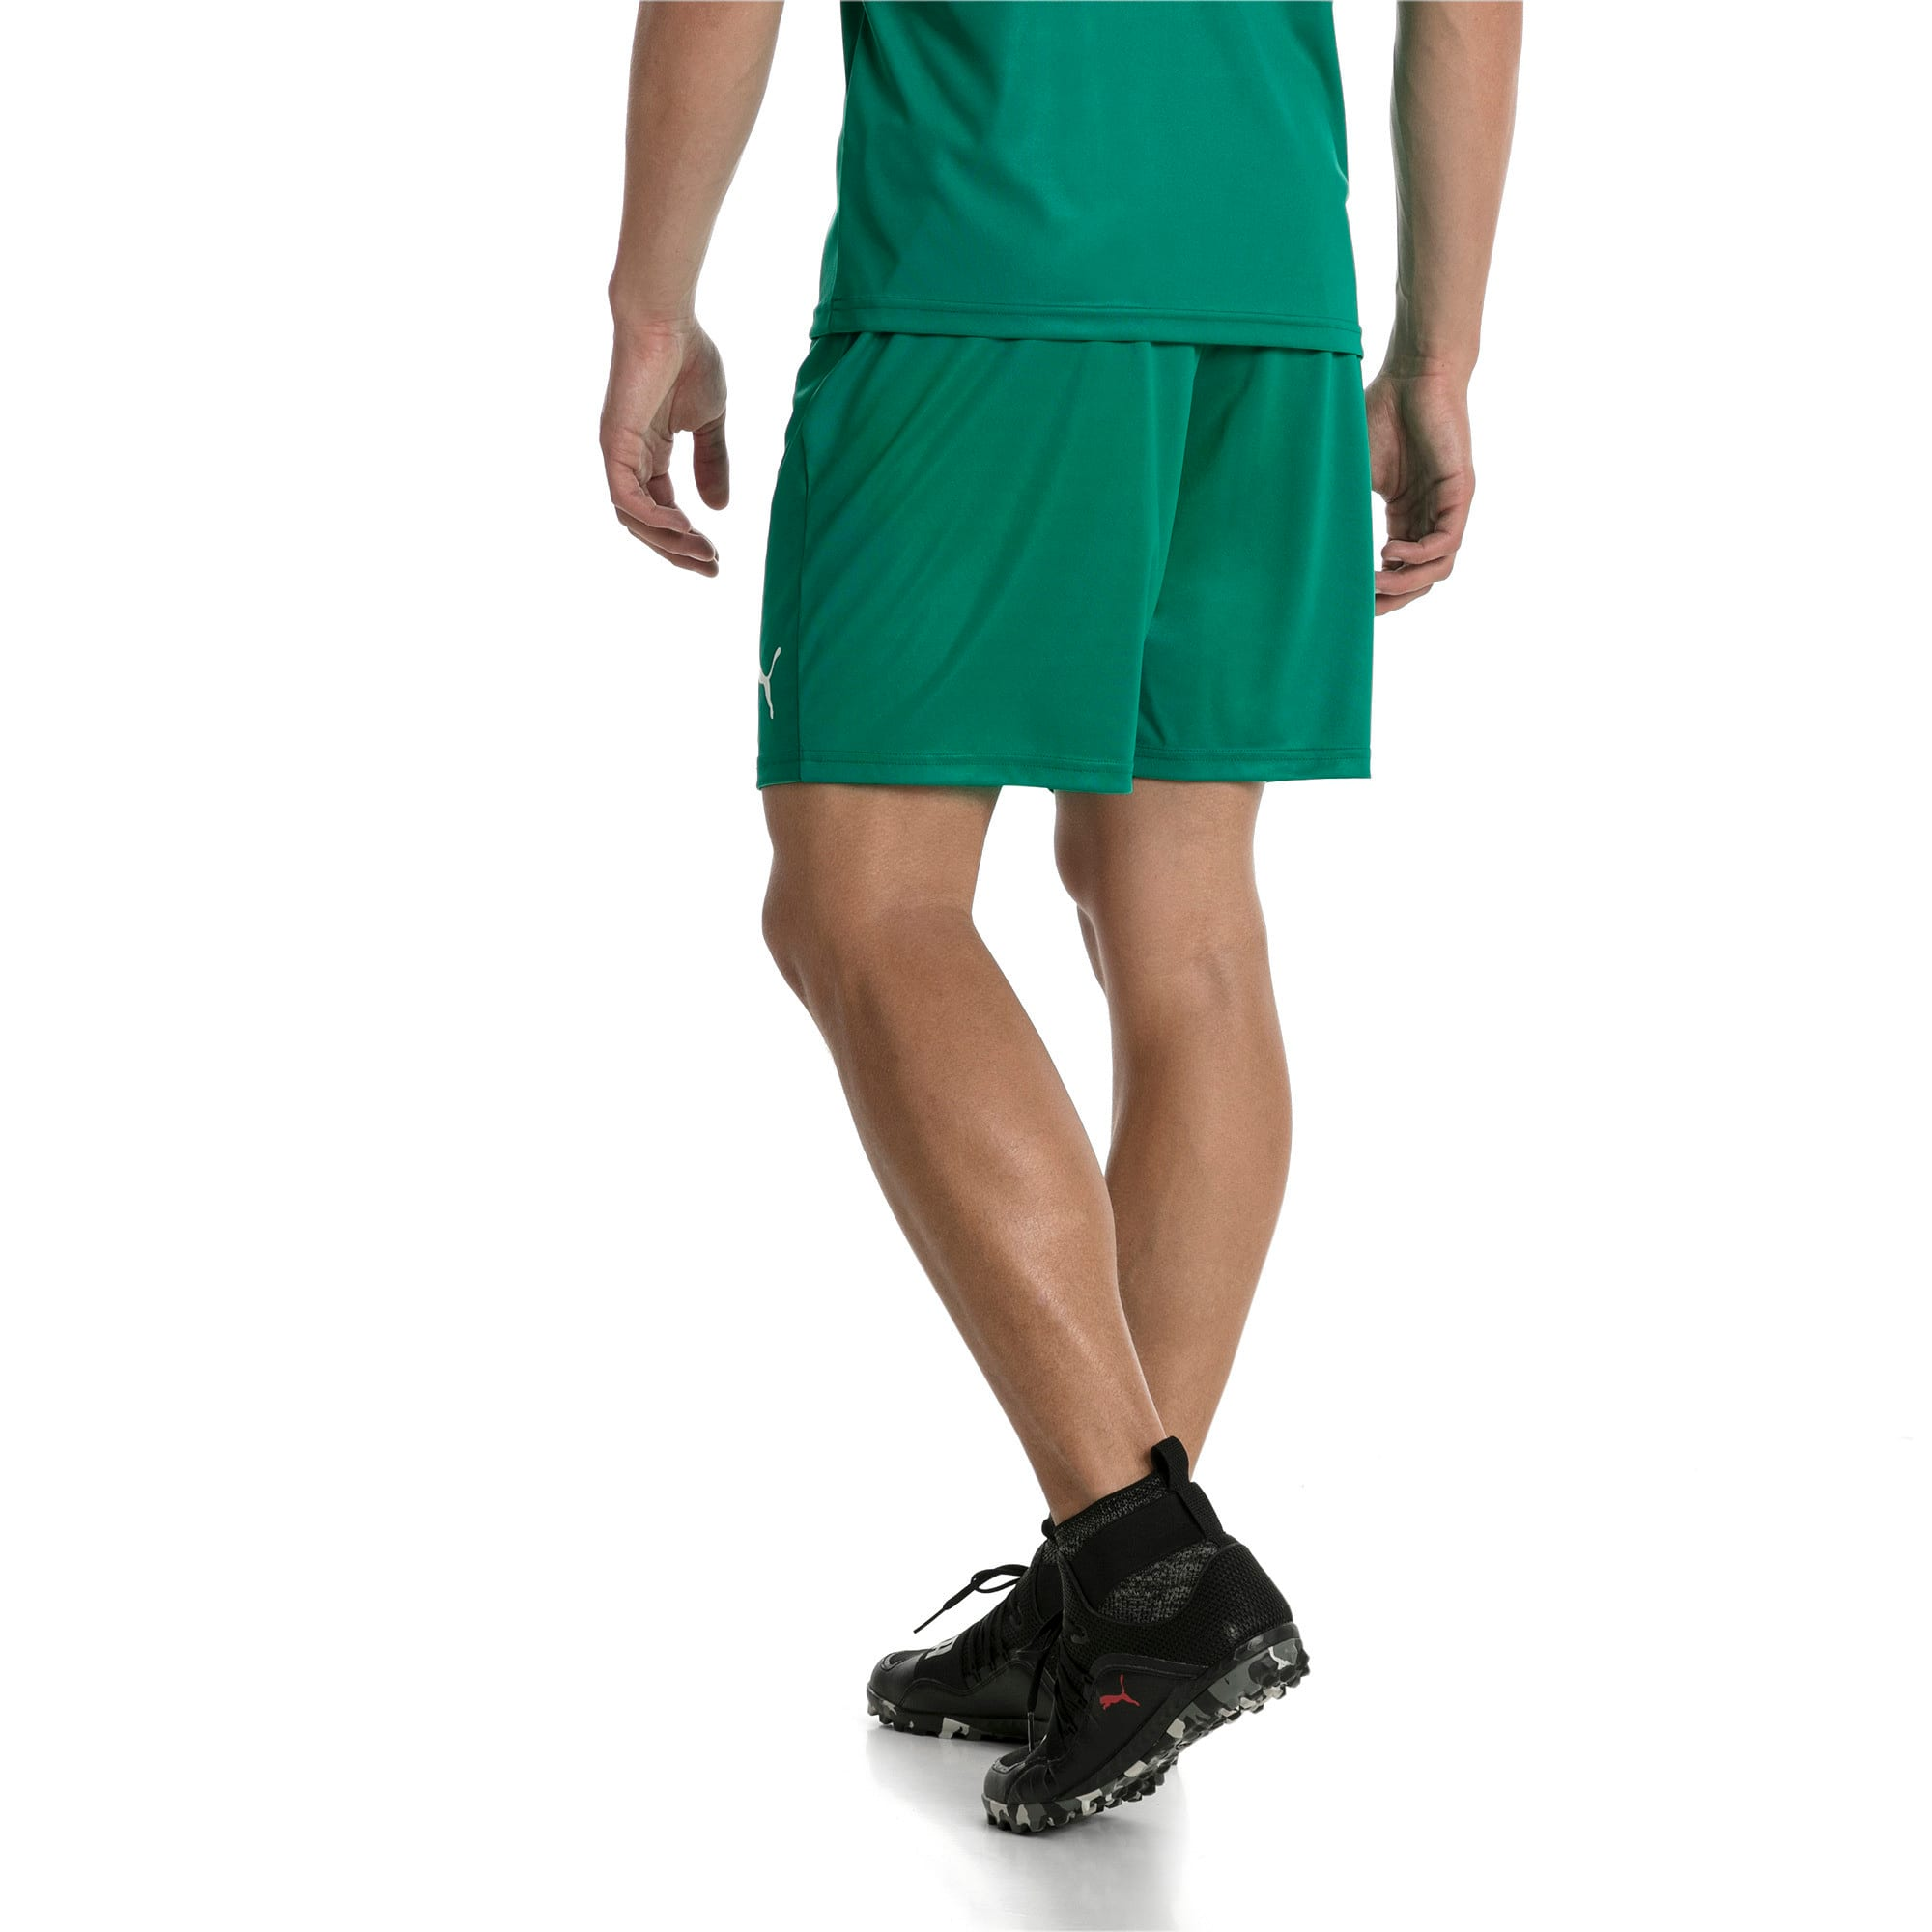 Thumbnail 3 of Liga Core Men's Shorts, Pepper Green-Puma White, medium